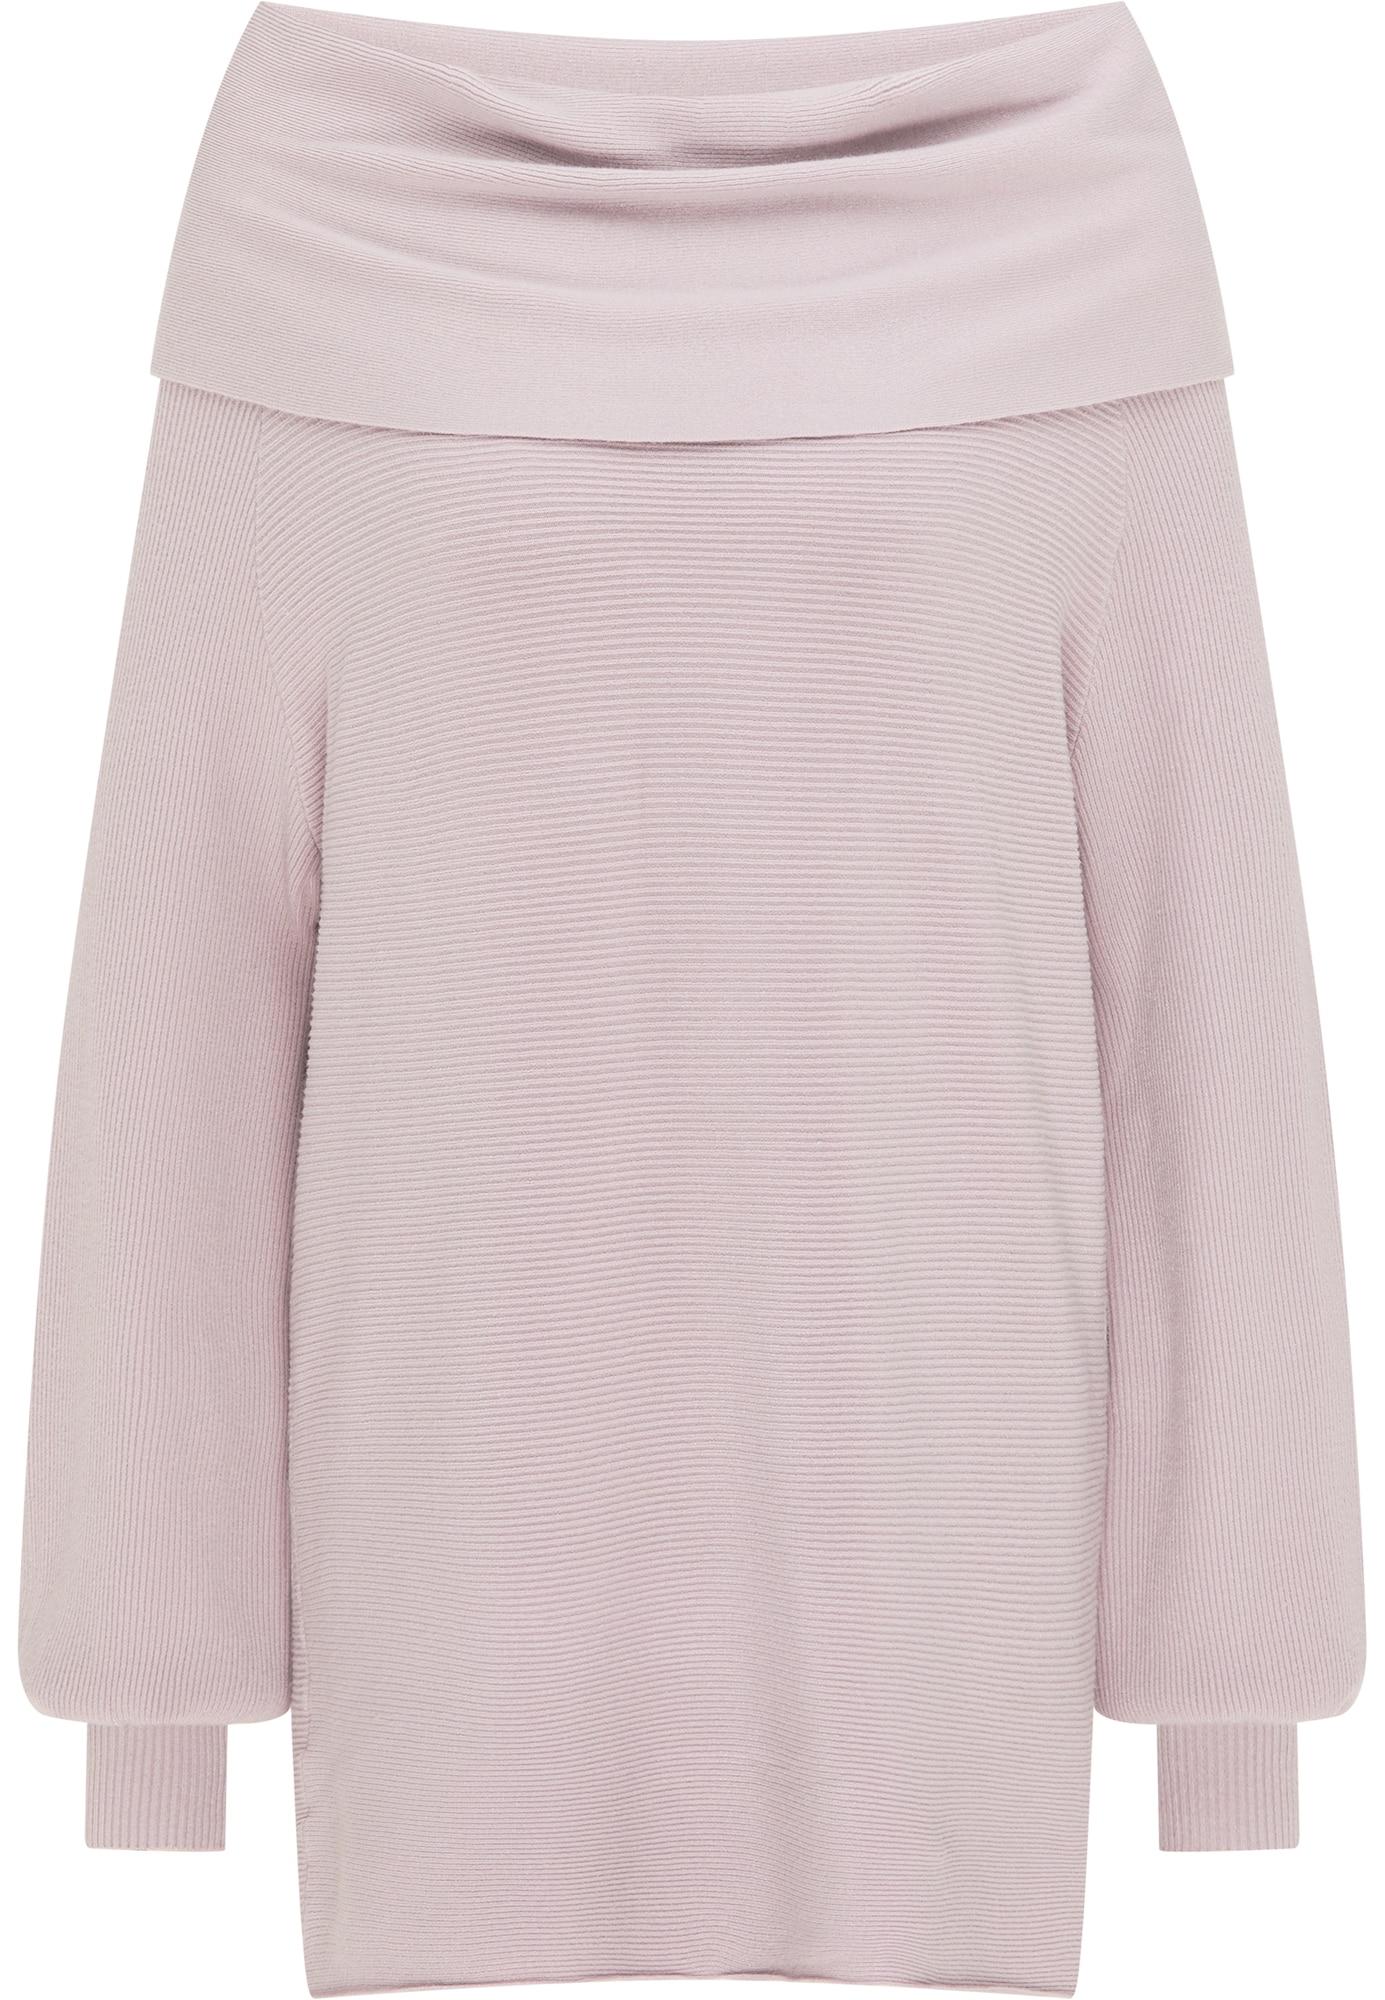 usha WHITE LABEL Megztinis levandų spalva